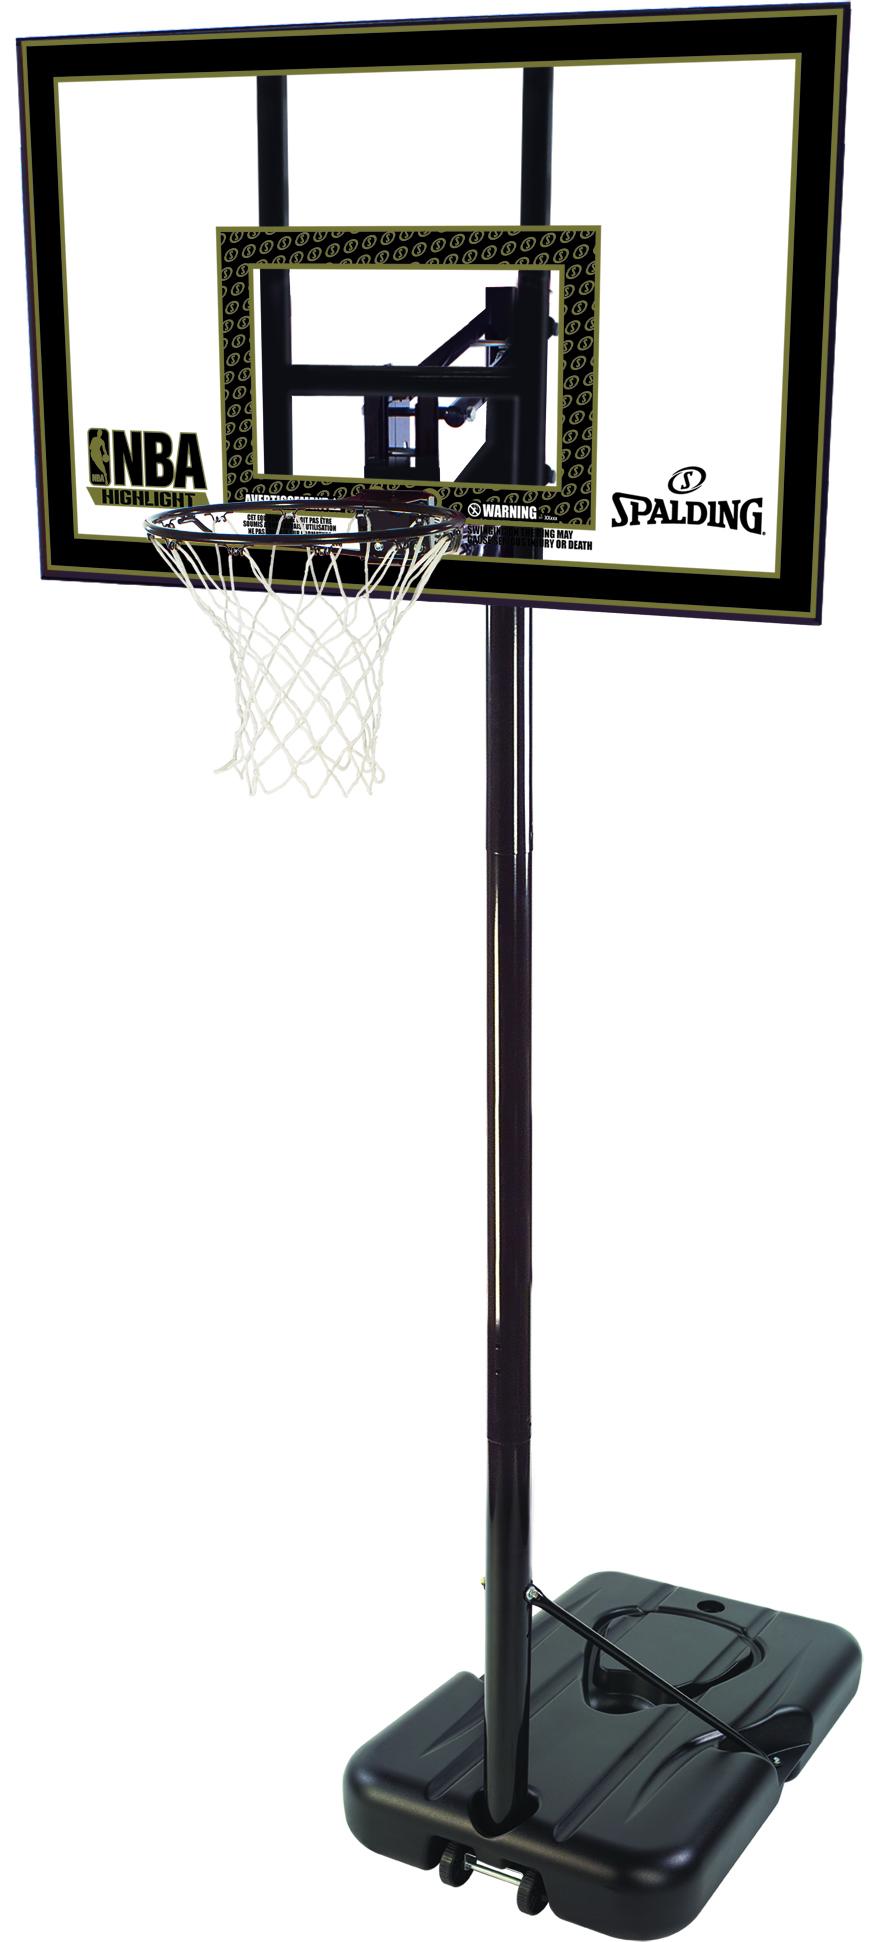 Spalding Баскетбольная стойка 2013 Highlight 42 Acrylic System